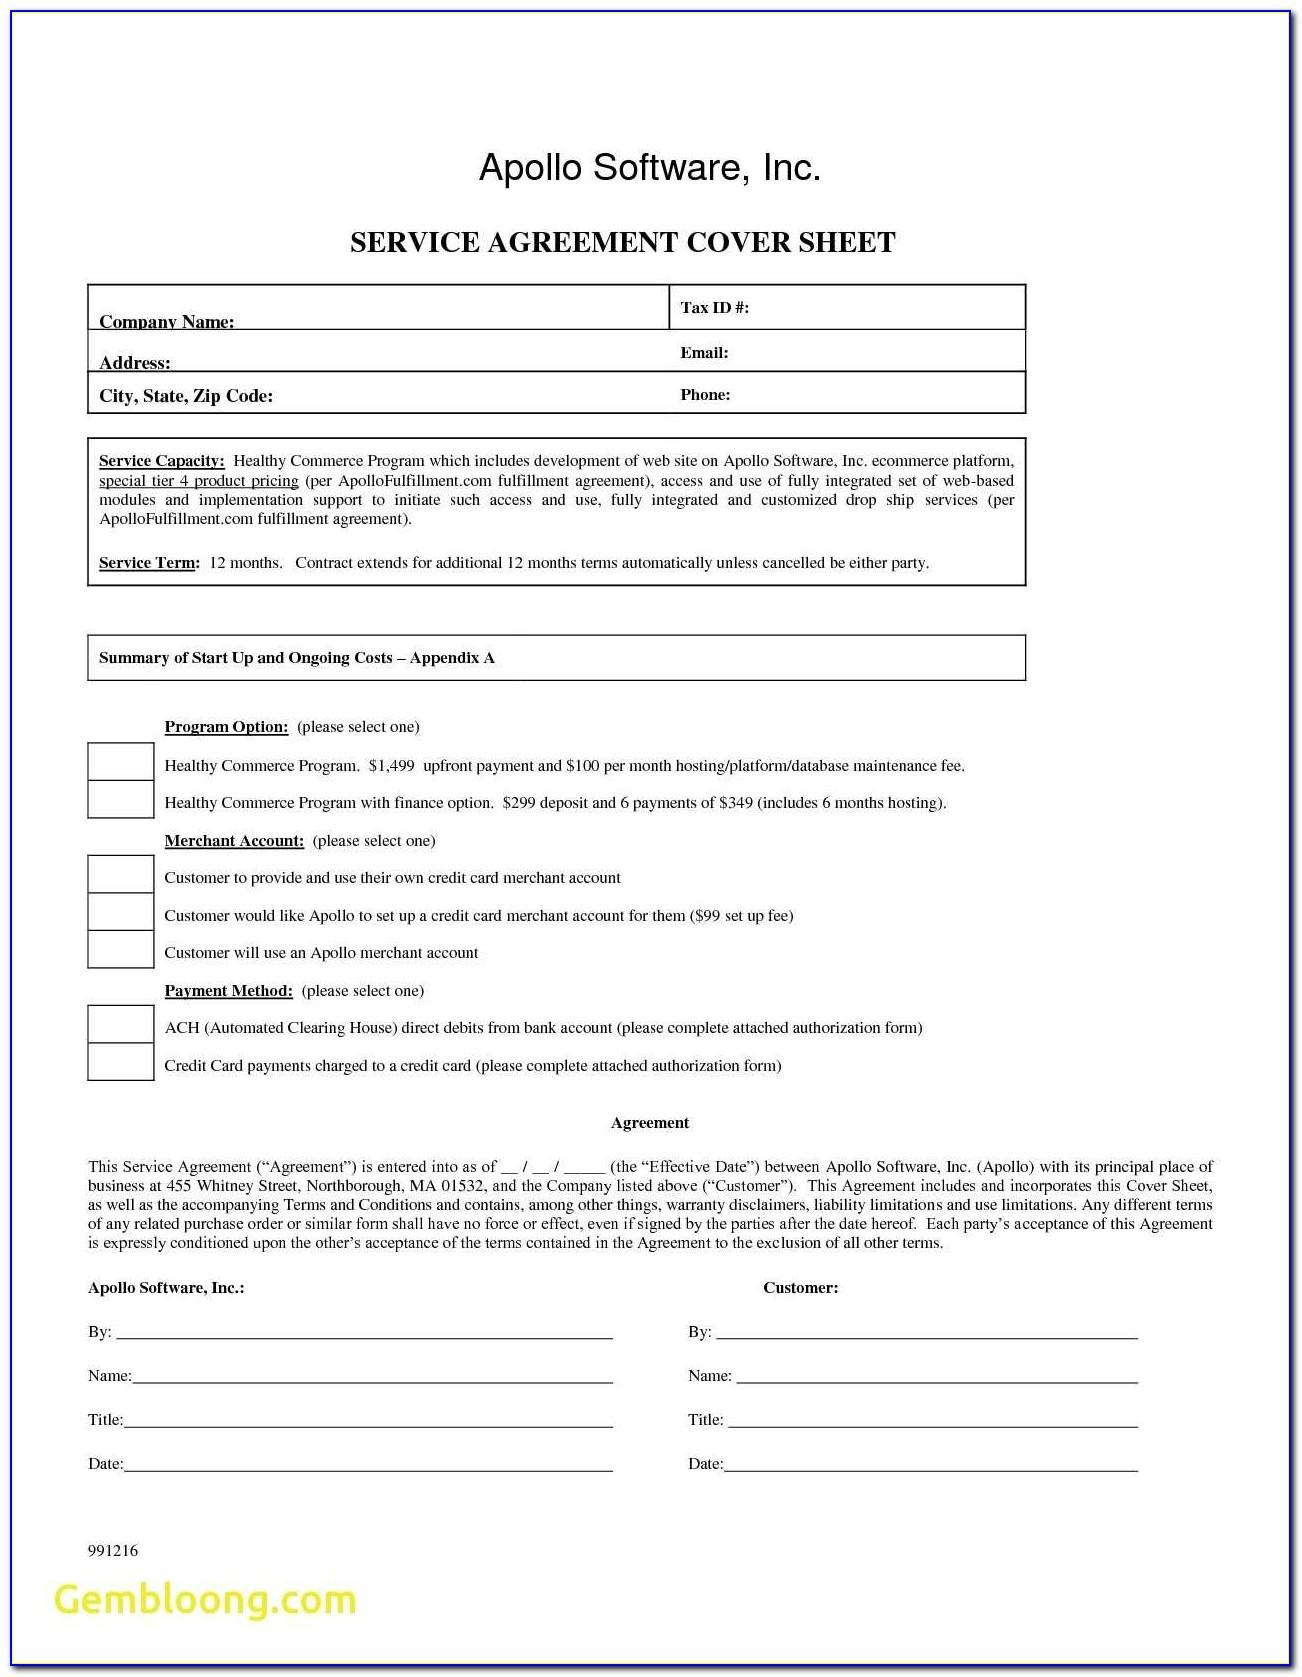 Ach Draft Authorization Form